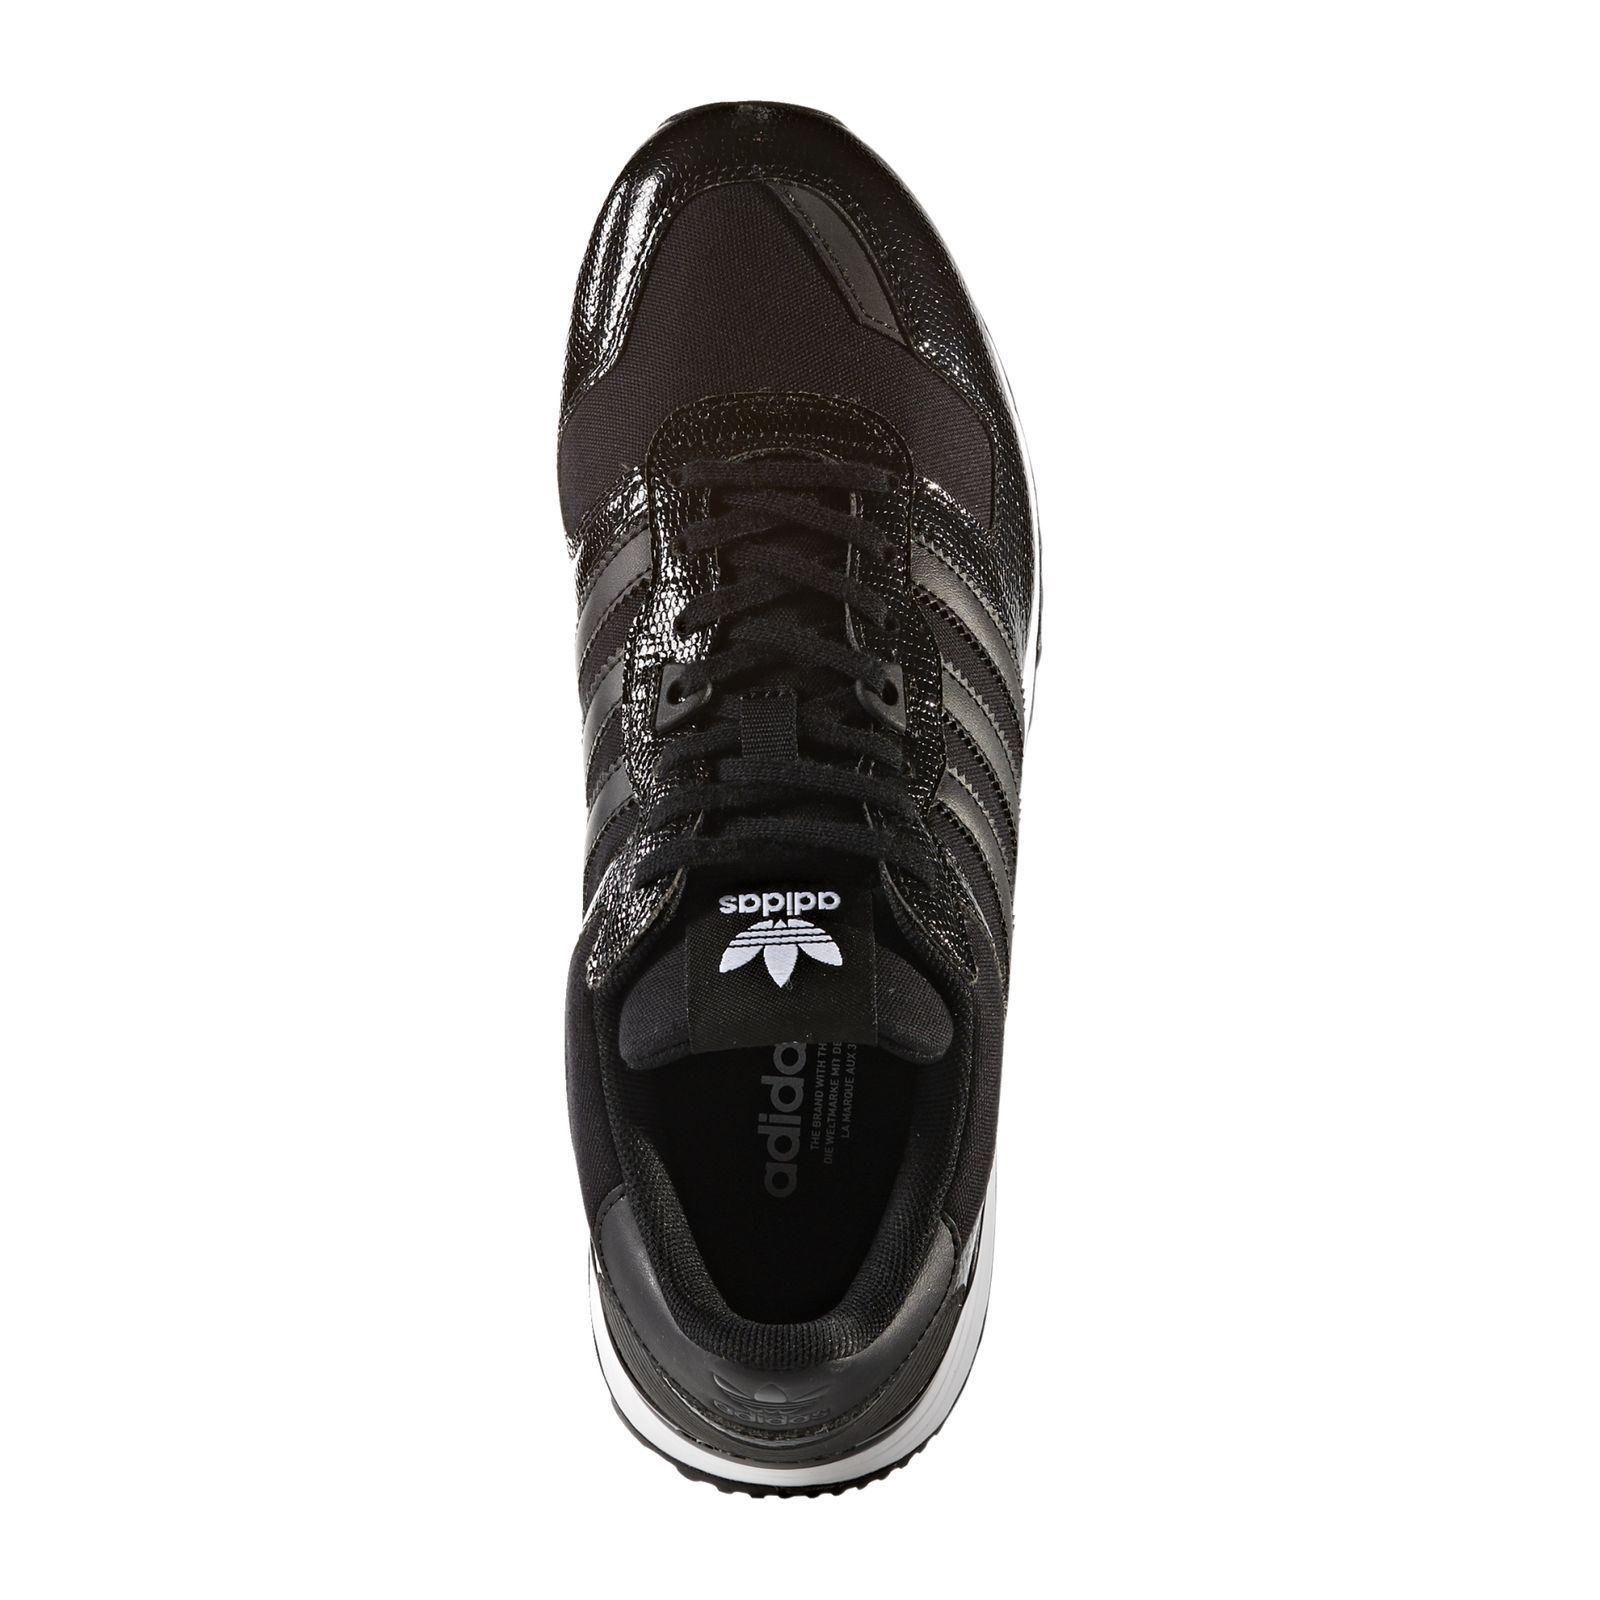 more photos 04747 eddaa adidas zx cuir pour des sorties bon marché. expertimmo30.fr